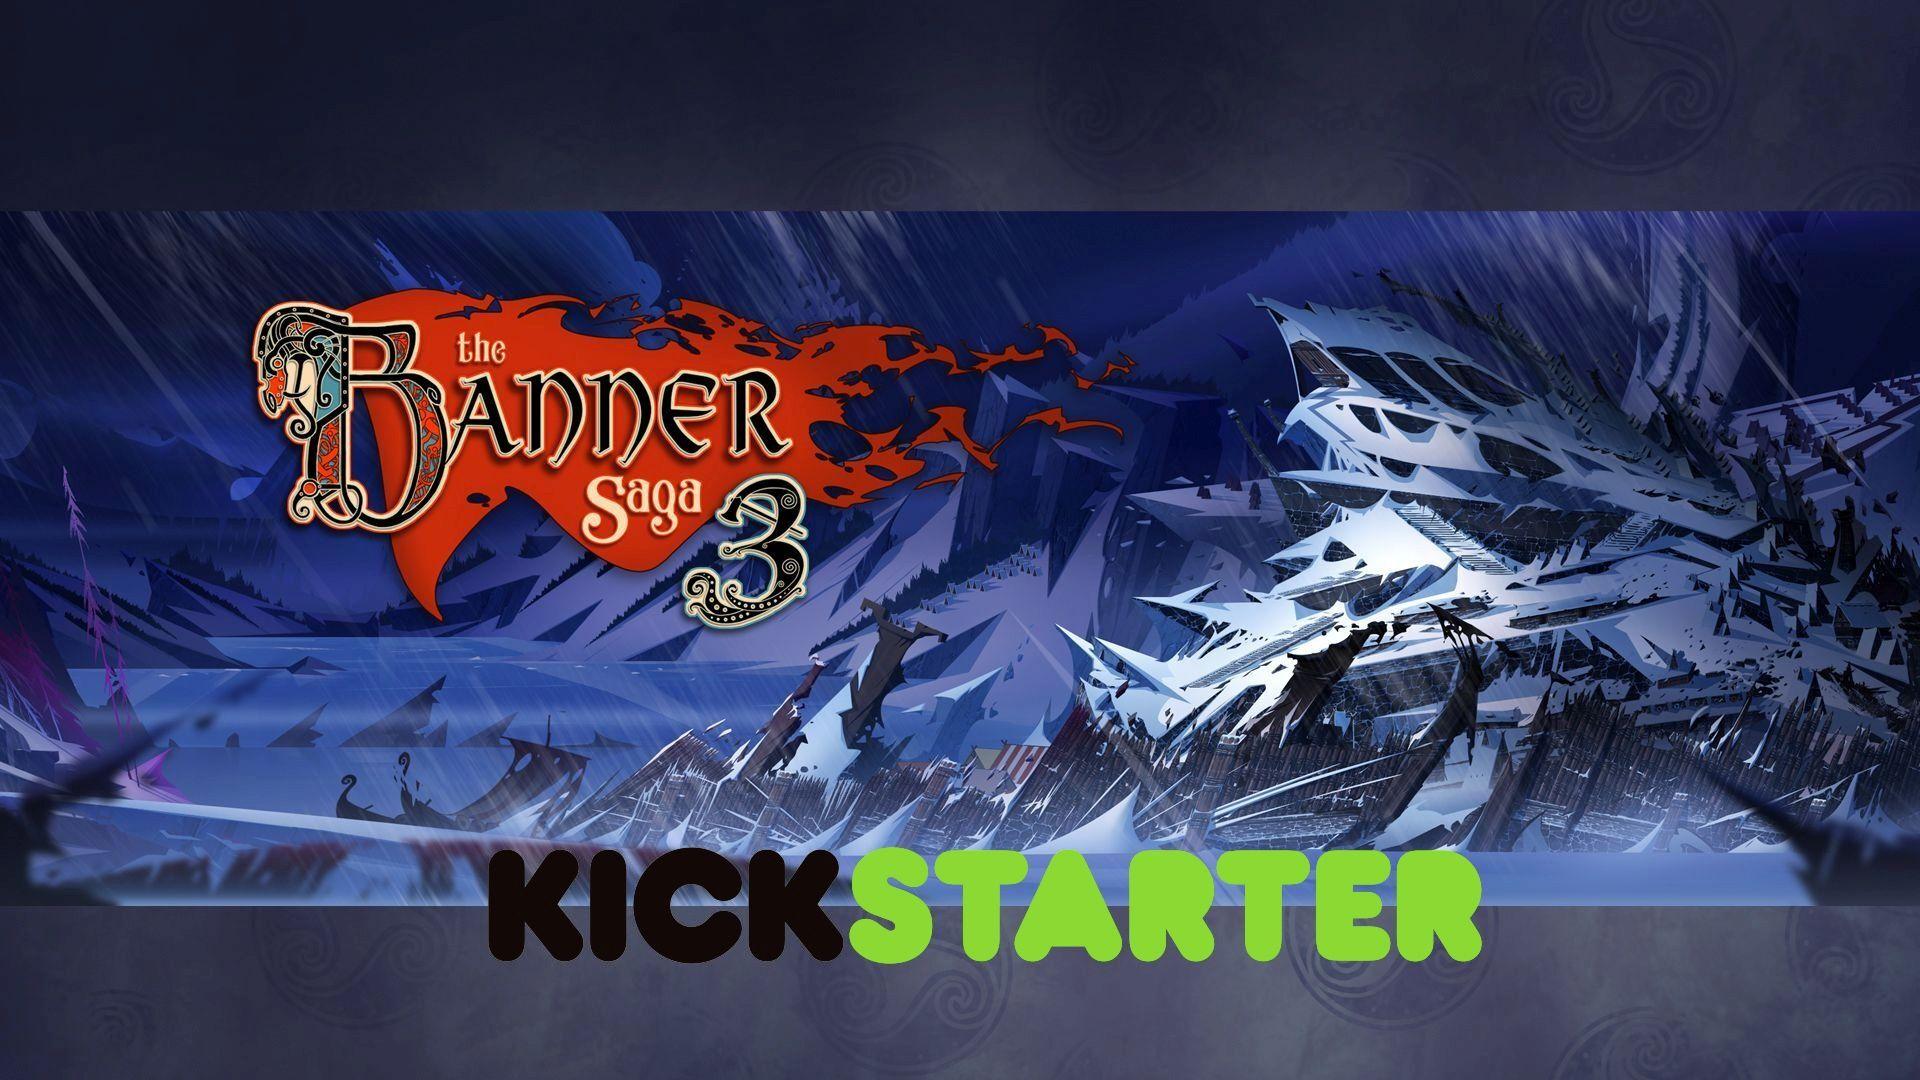 BS3 Kickstarter Graphic